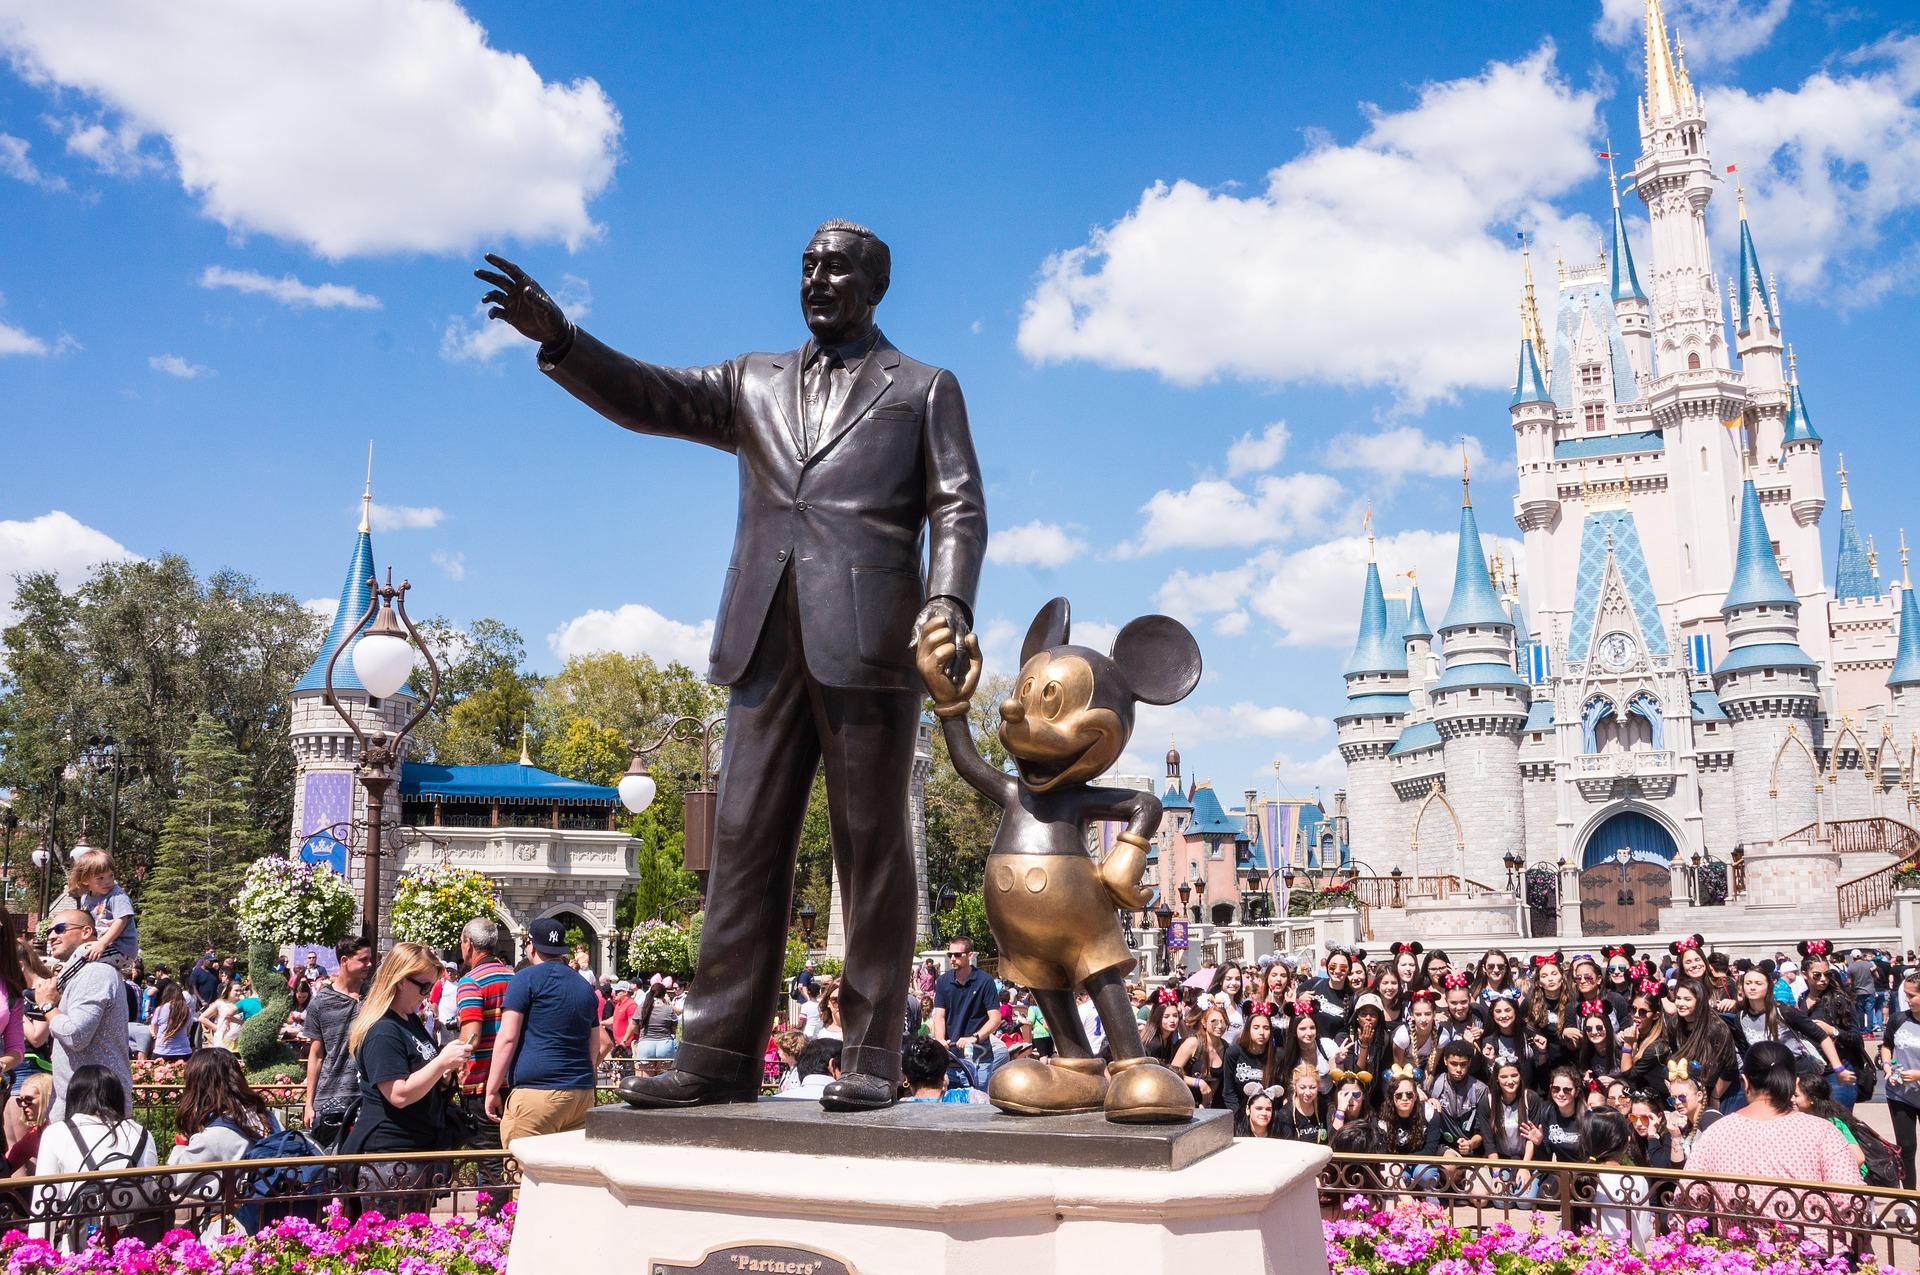 Impariamo da Walt Disney - Zampotta